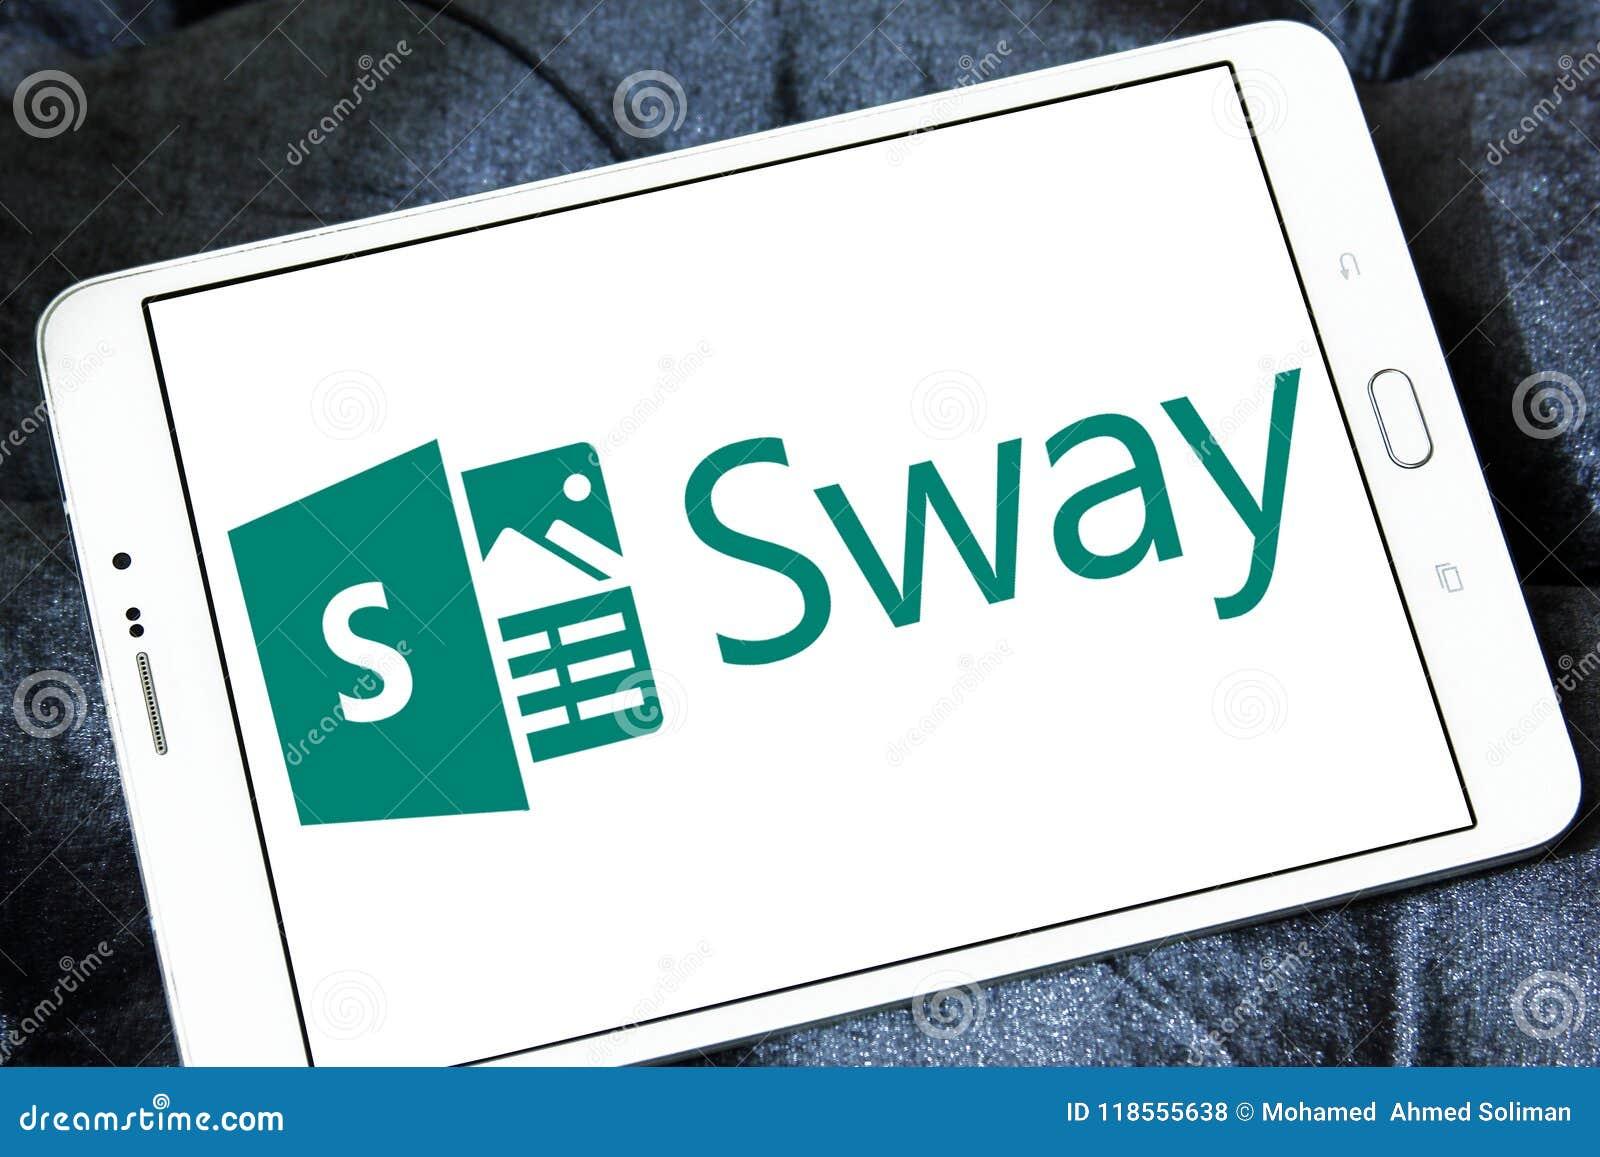 Download Microsoft Office Sway Logo Editorial Stock Photo Image Of Logos